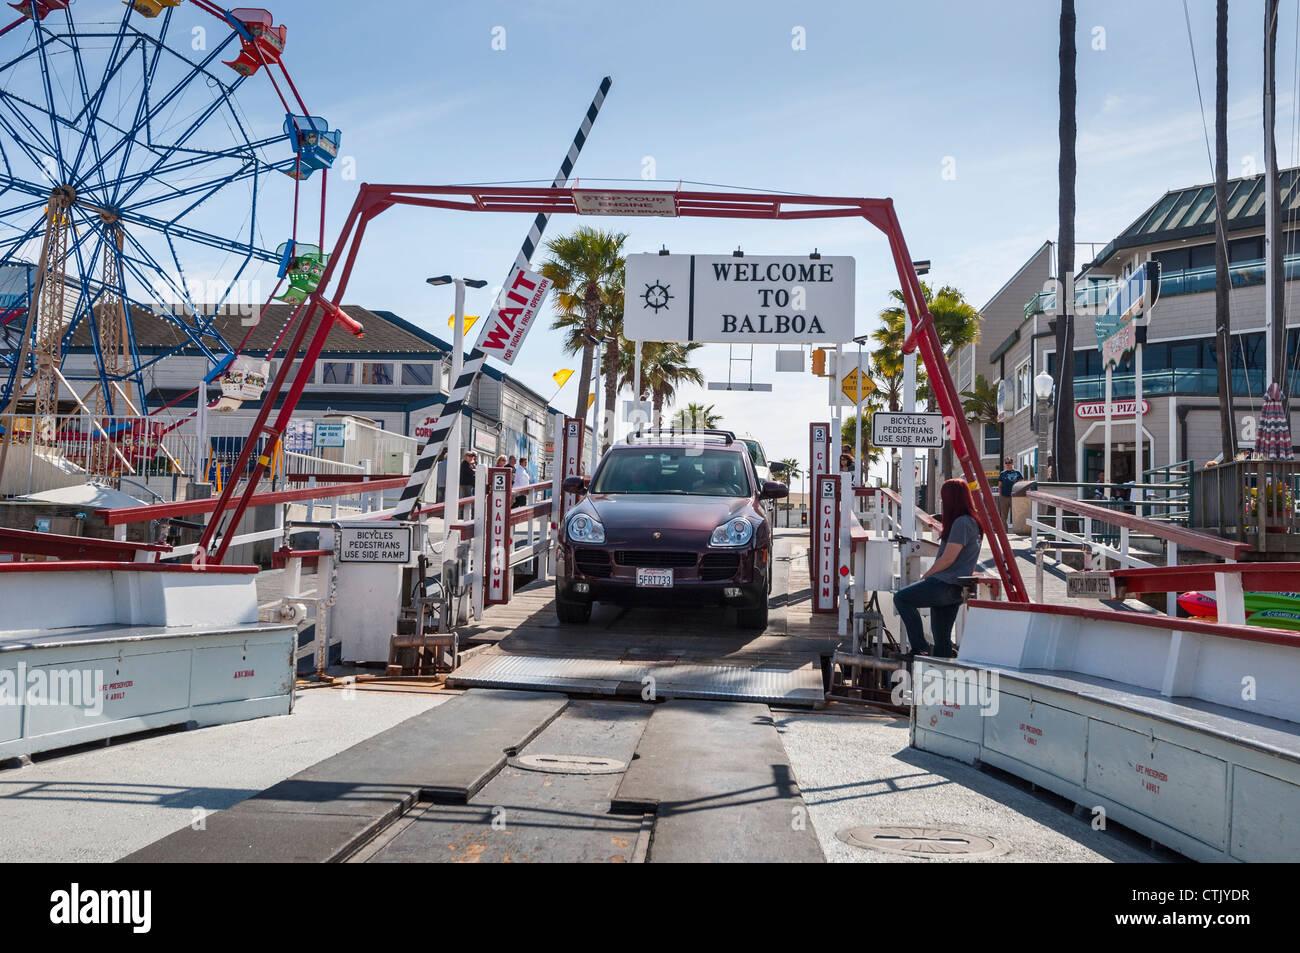 Taxi Service In Newport Beach California